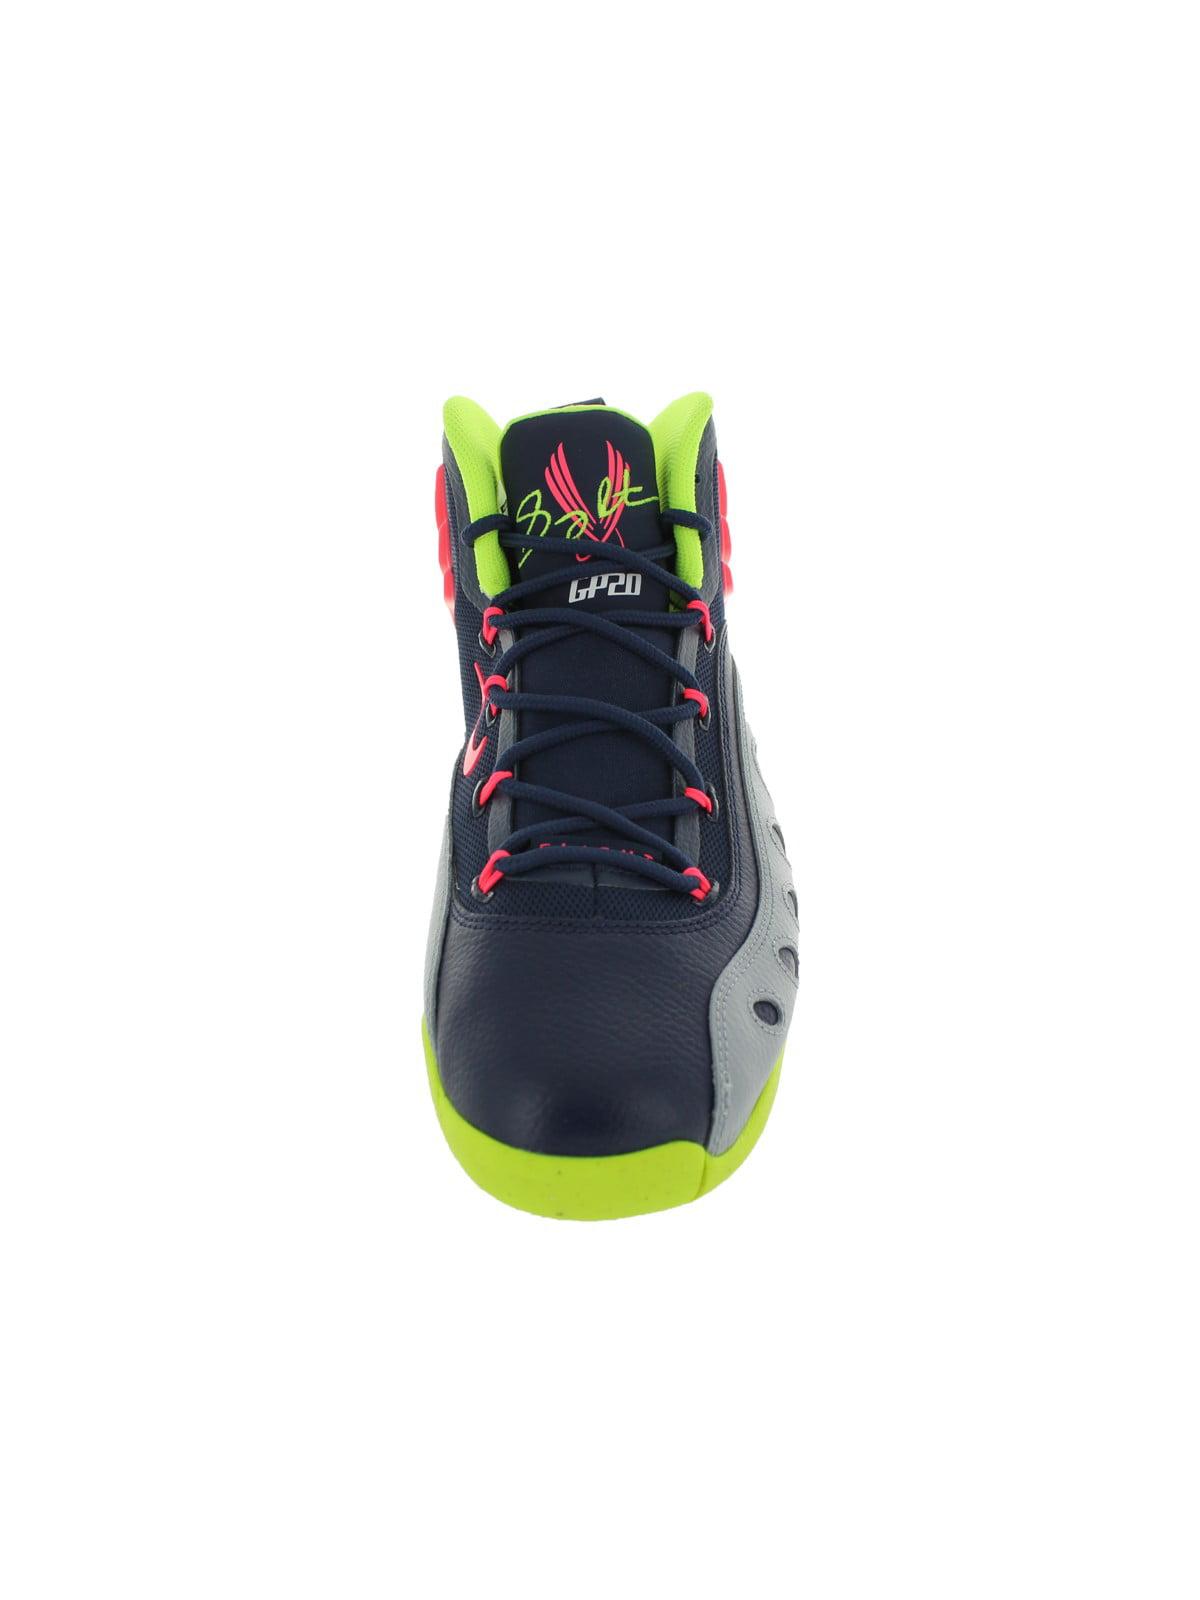 Nike Men's Sonic Flight Basketball Shoe